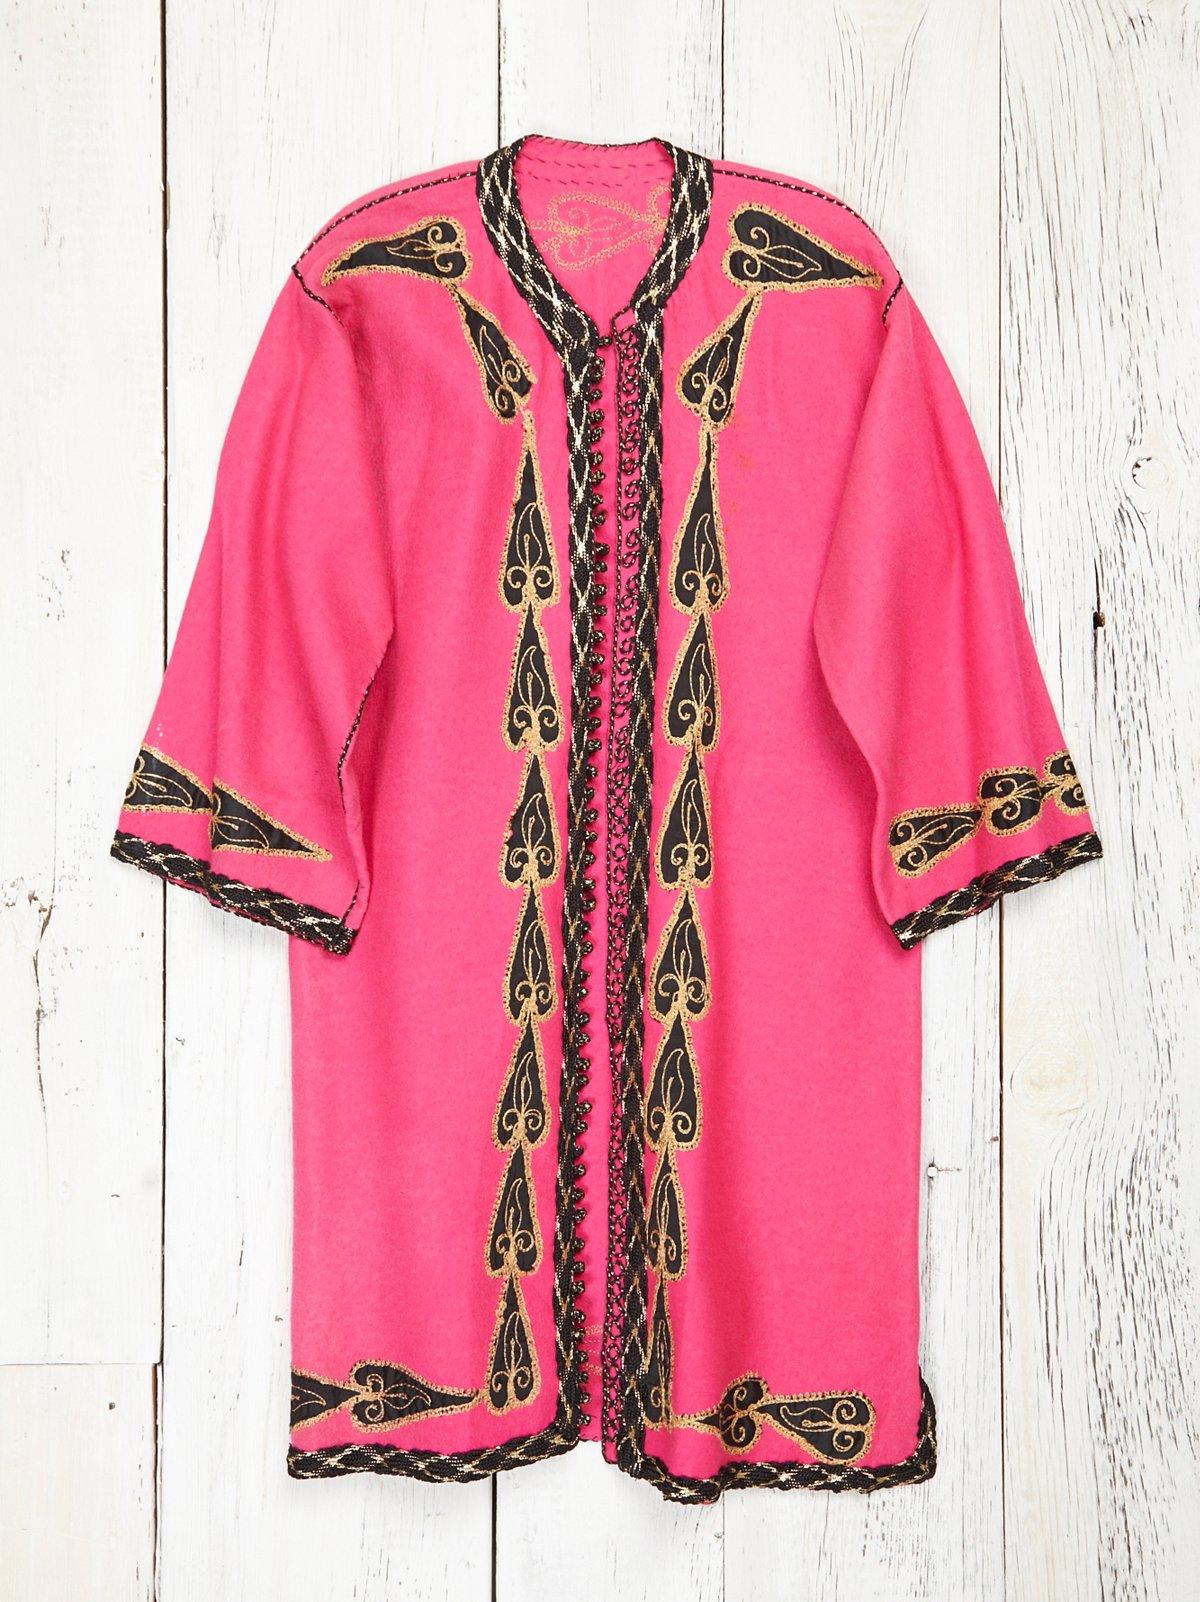 Vintage Pink Felt Coat